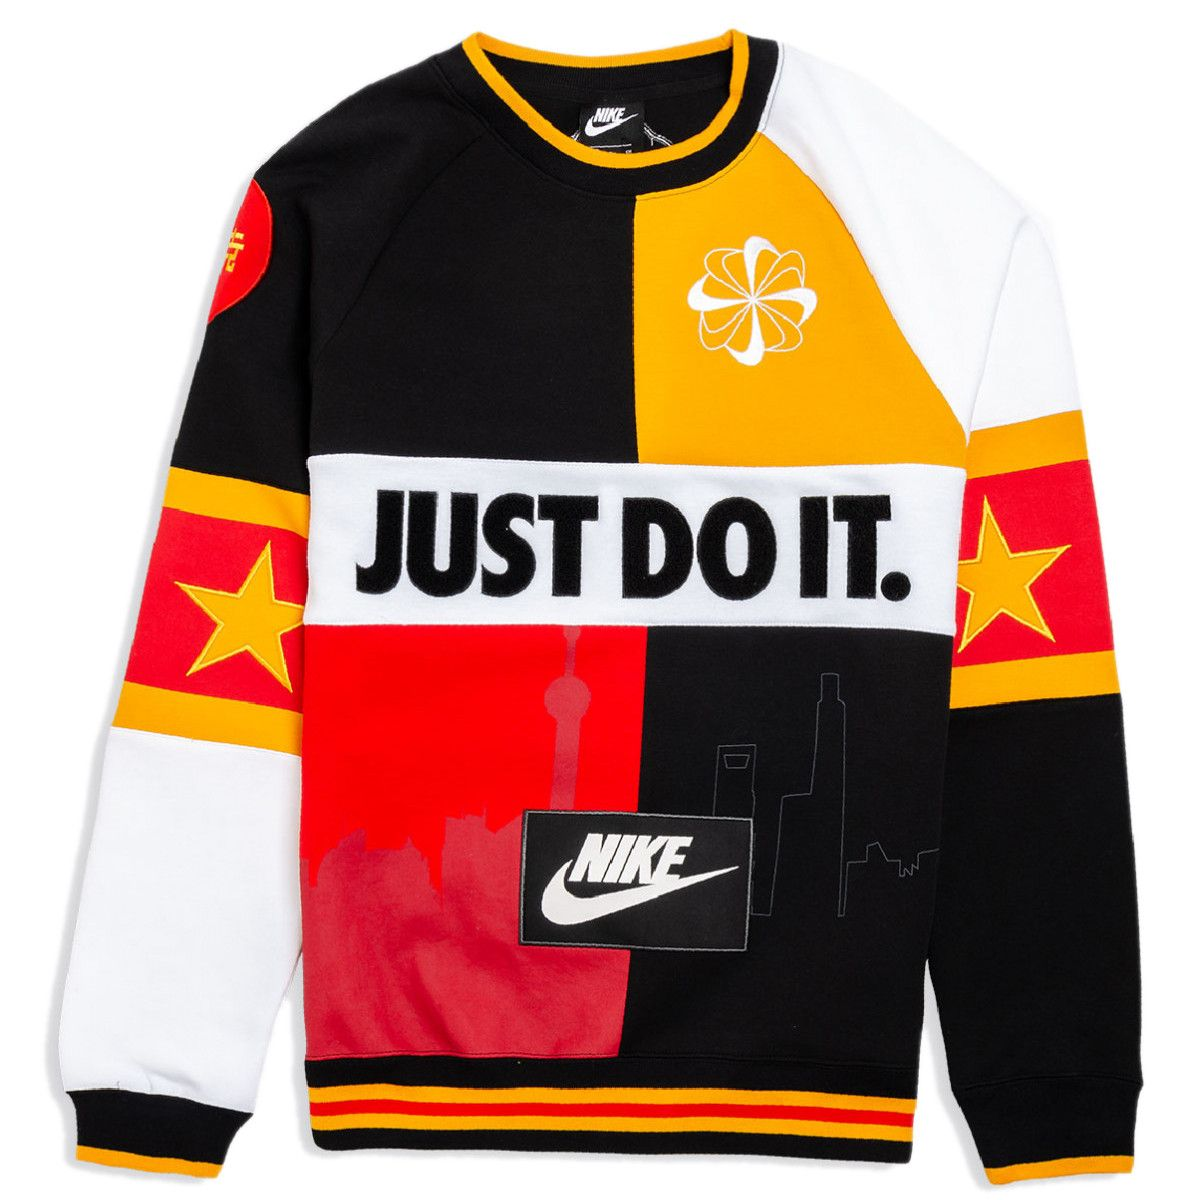 Regeneración sin embargo juez  Sweat Nike SHANGHAI CREWNECK - Pegashoes